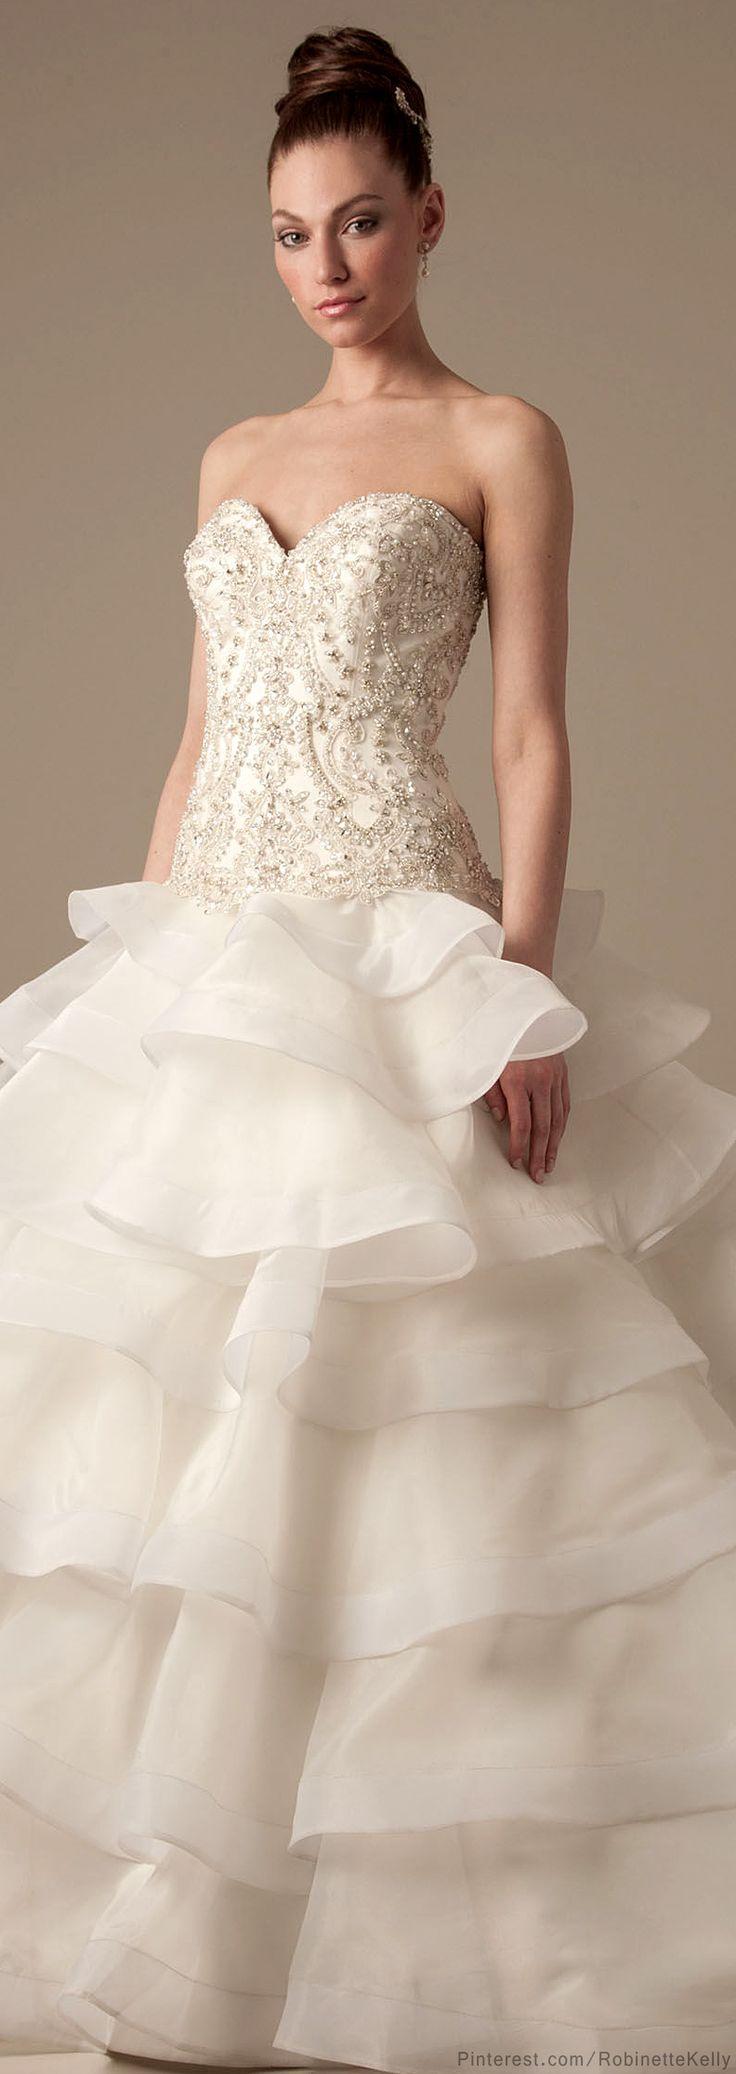 best dreamy wedding dress images on pinterest engagements